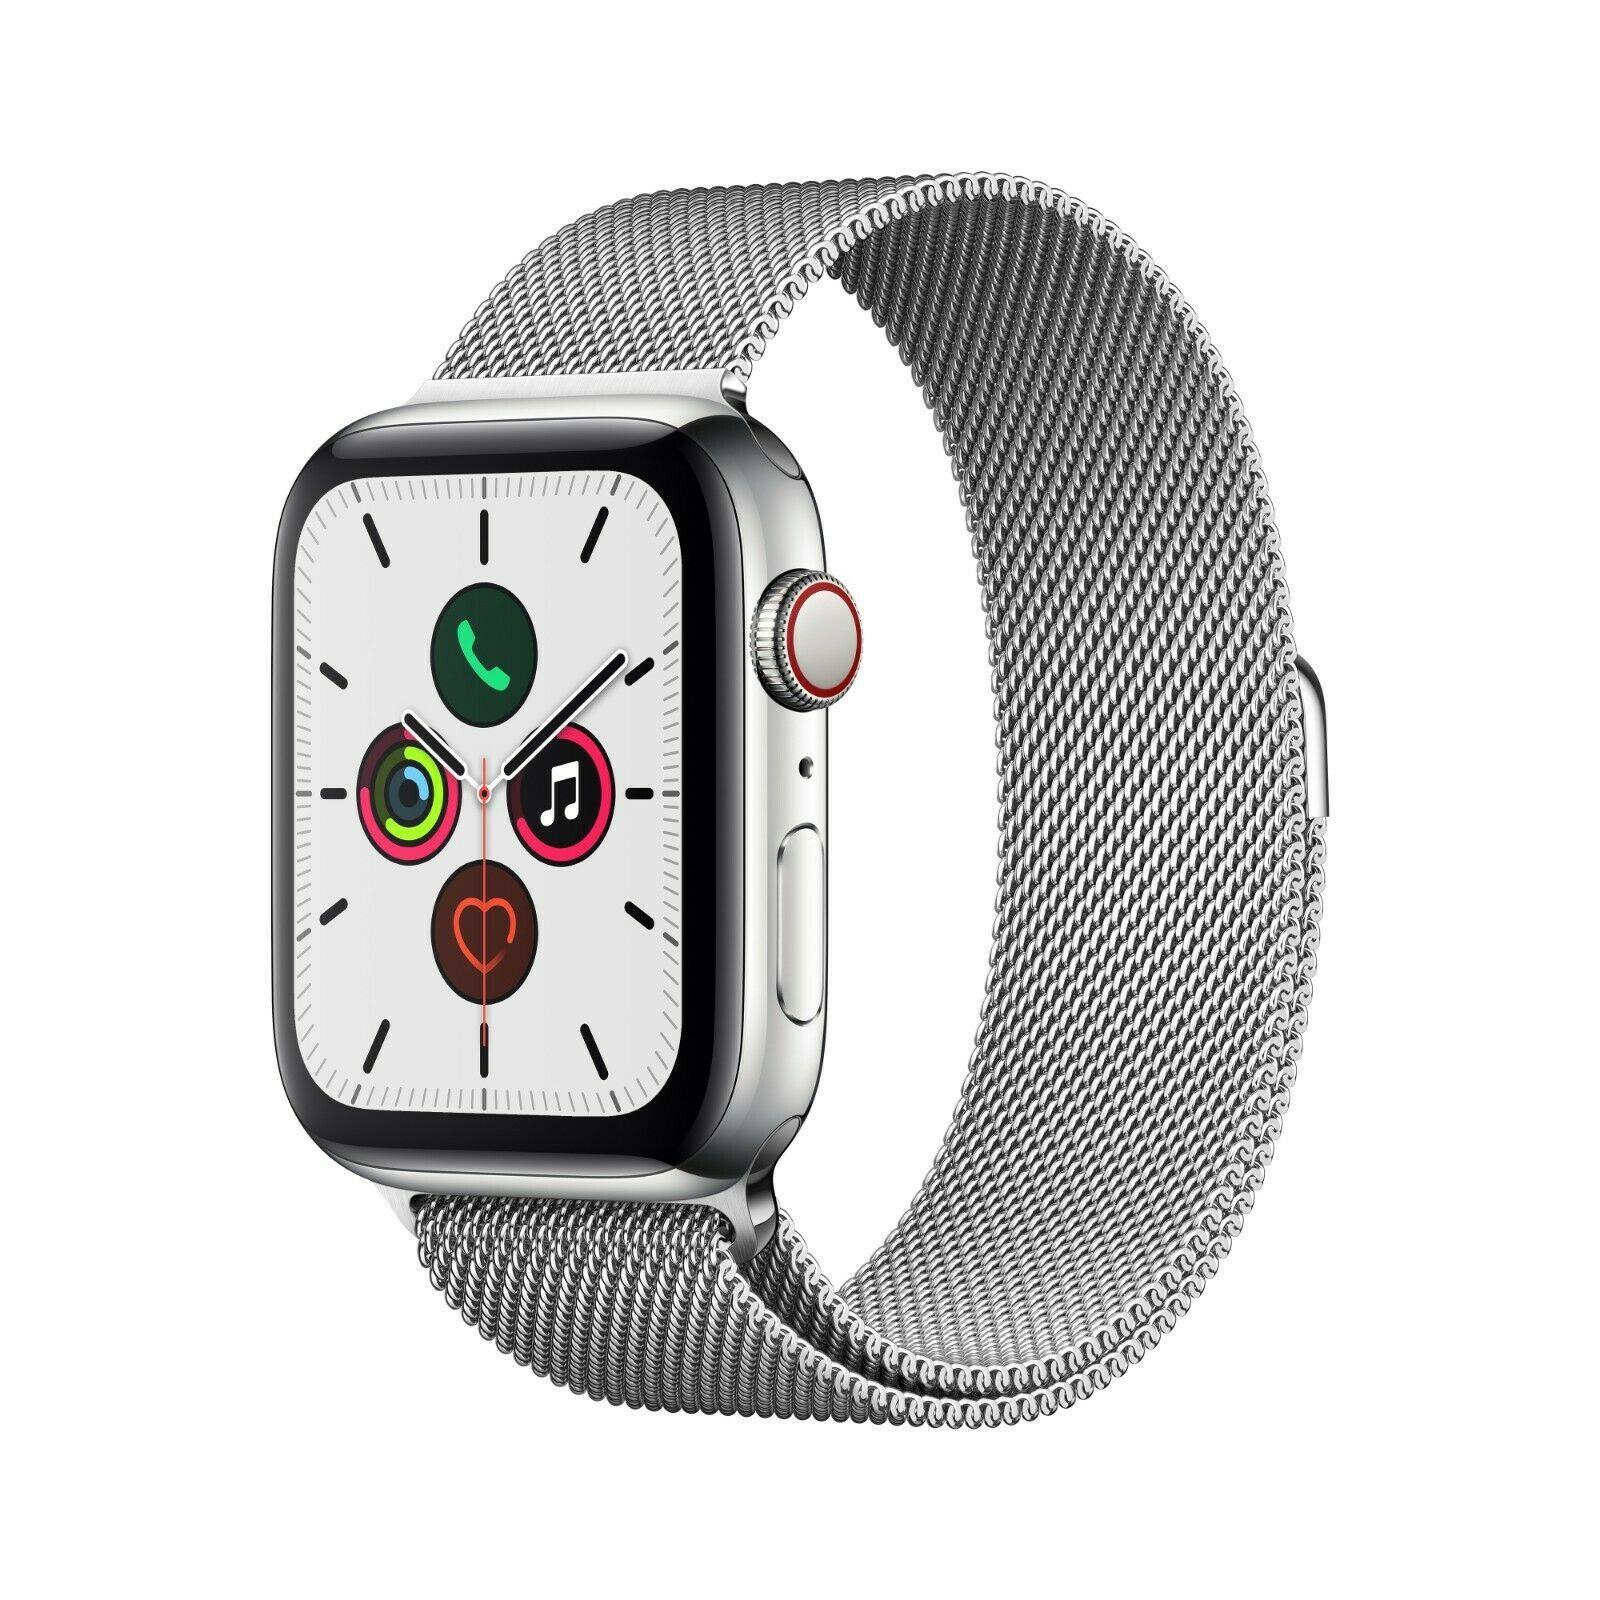 Pin By Azza On Aleatorio In 2020 Buy Apple Watch Apple Watch Apple Watch Series